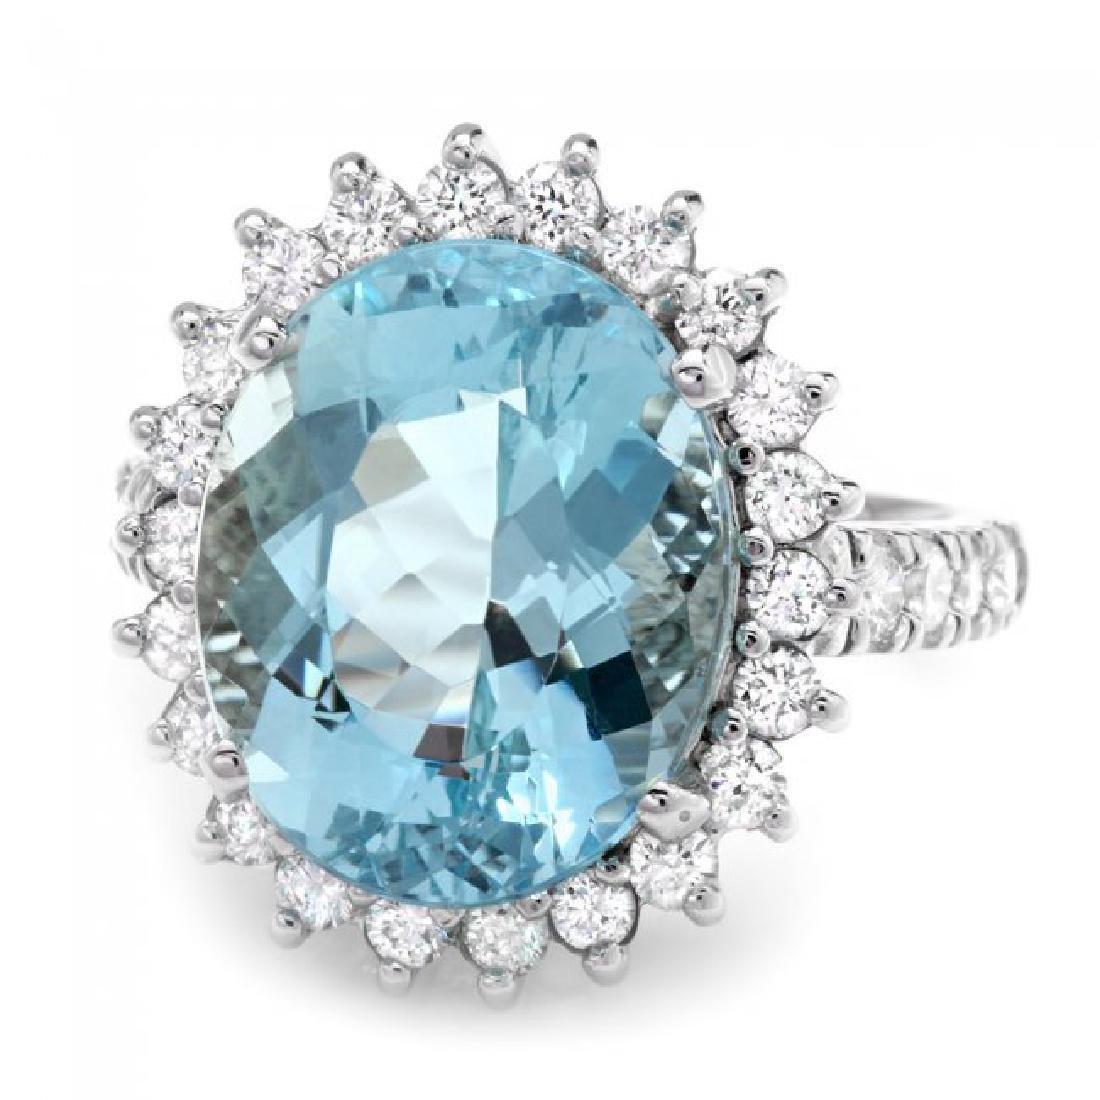 14k Gold 7.50ct Aquamarine 1.00ct Diamond Ring - 2